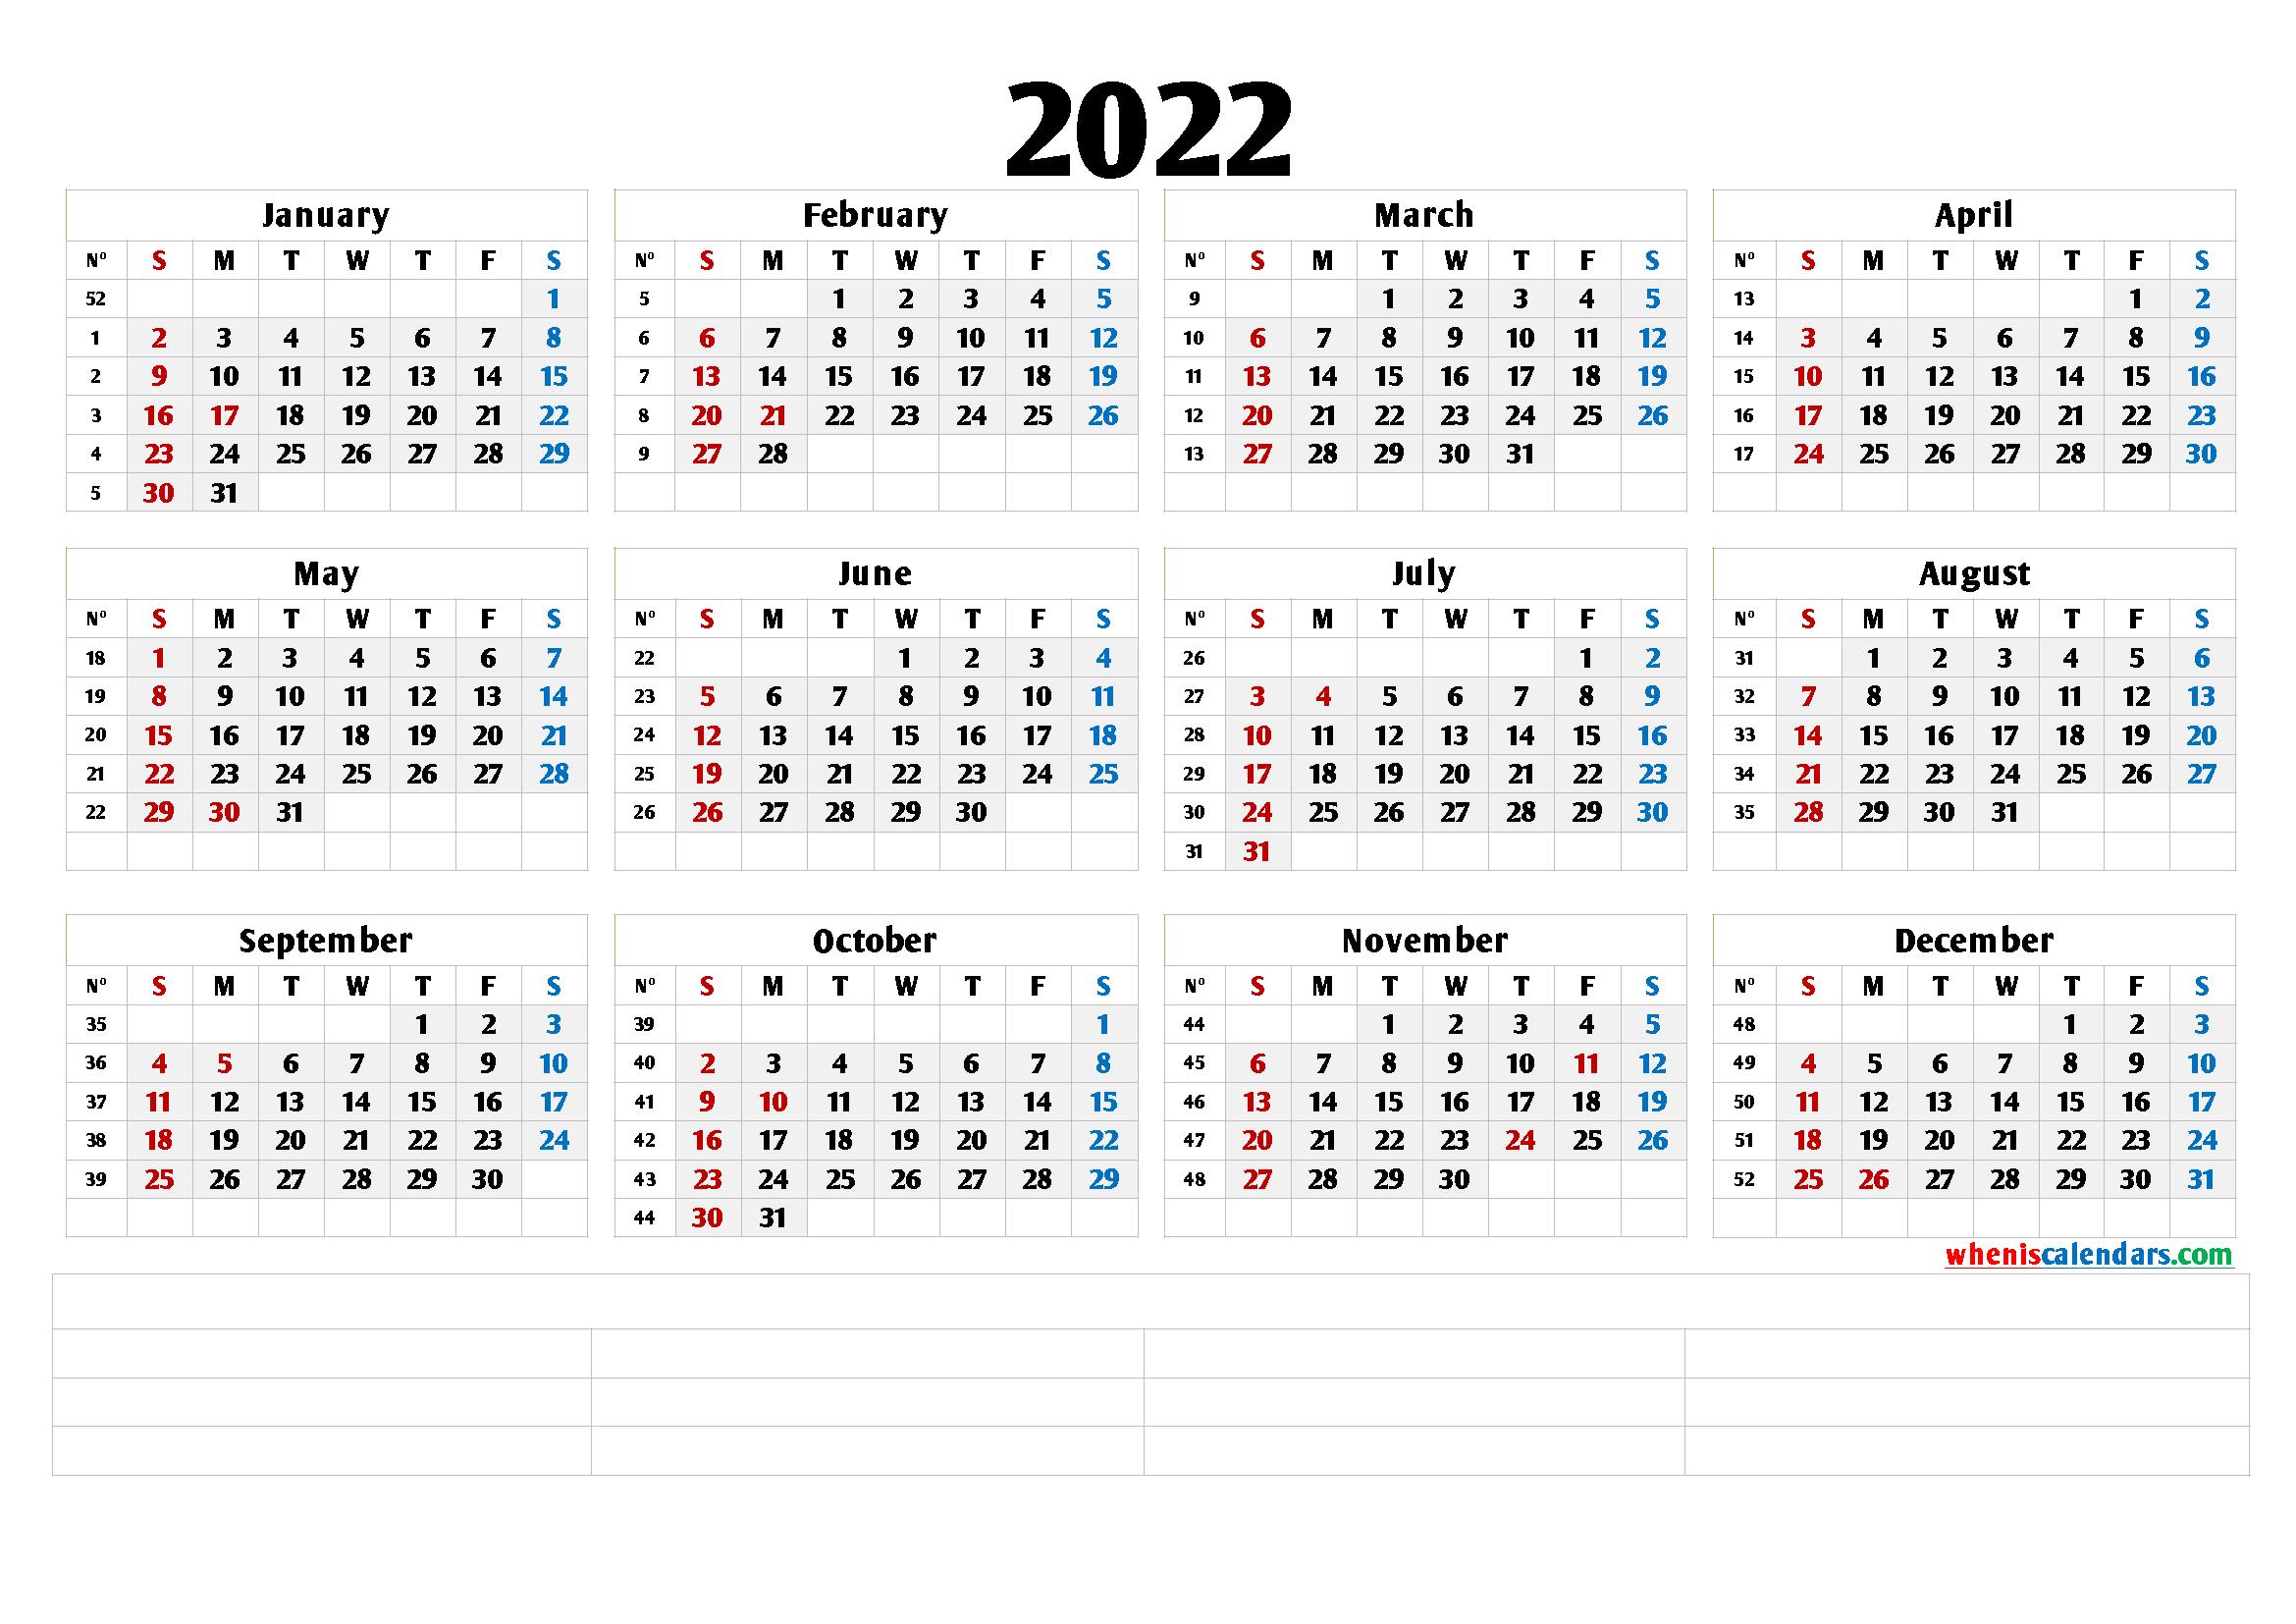 2022 Free Printable Yearly Calendar With Week Numbers (6